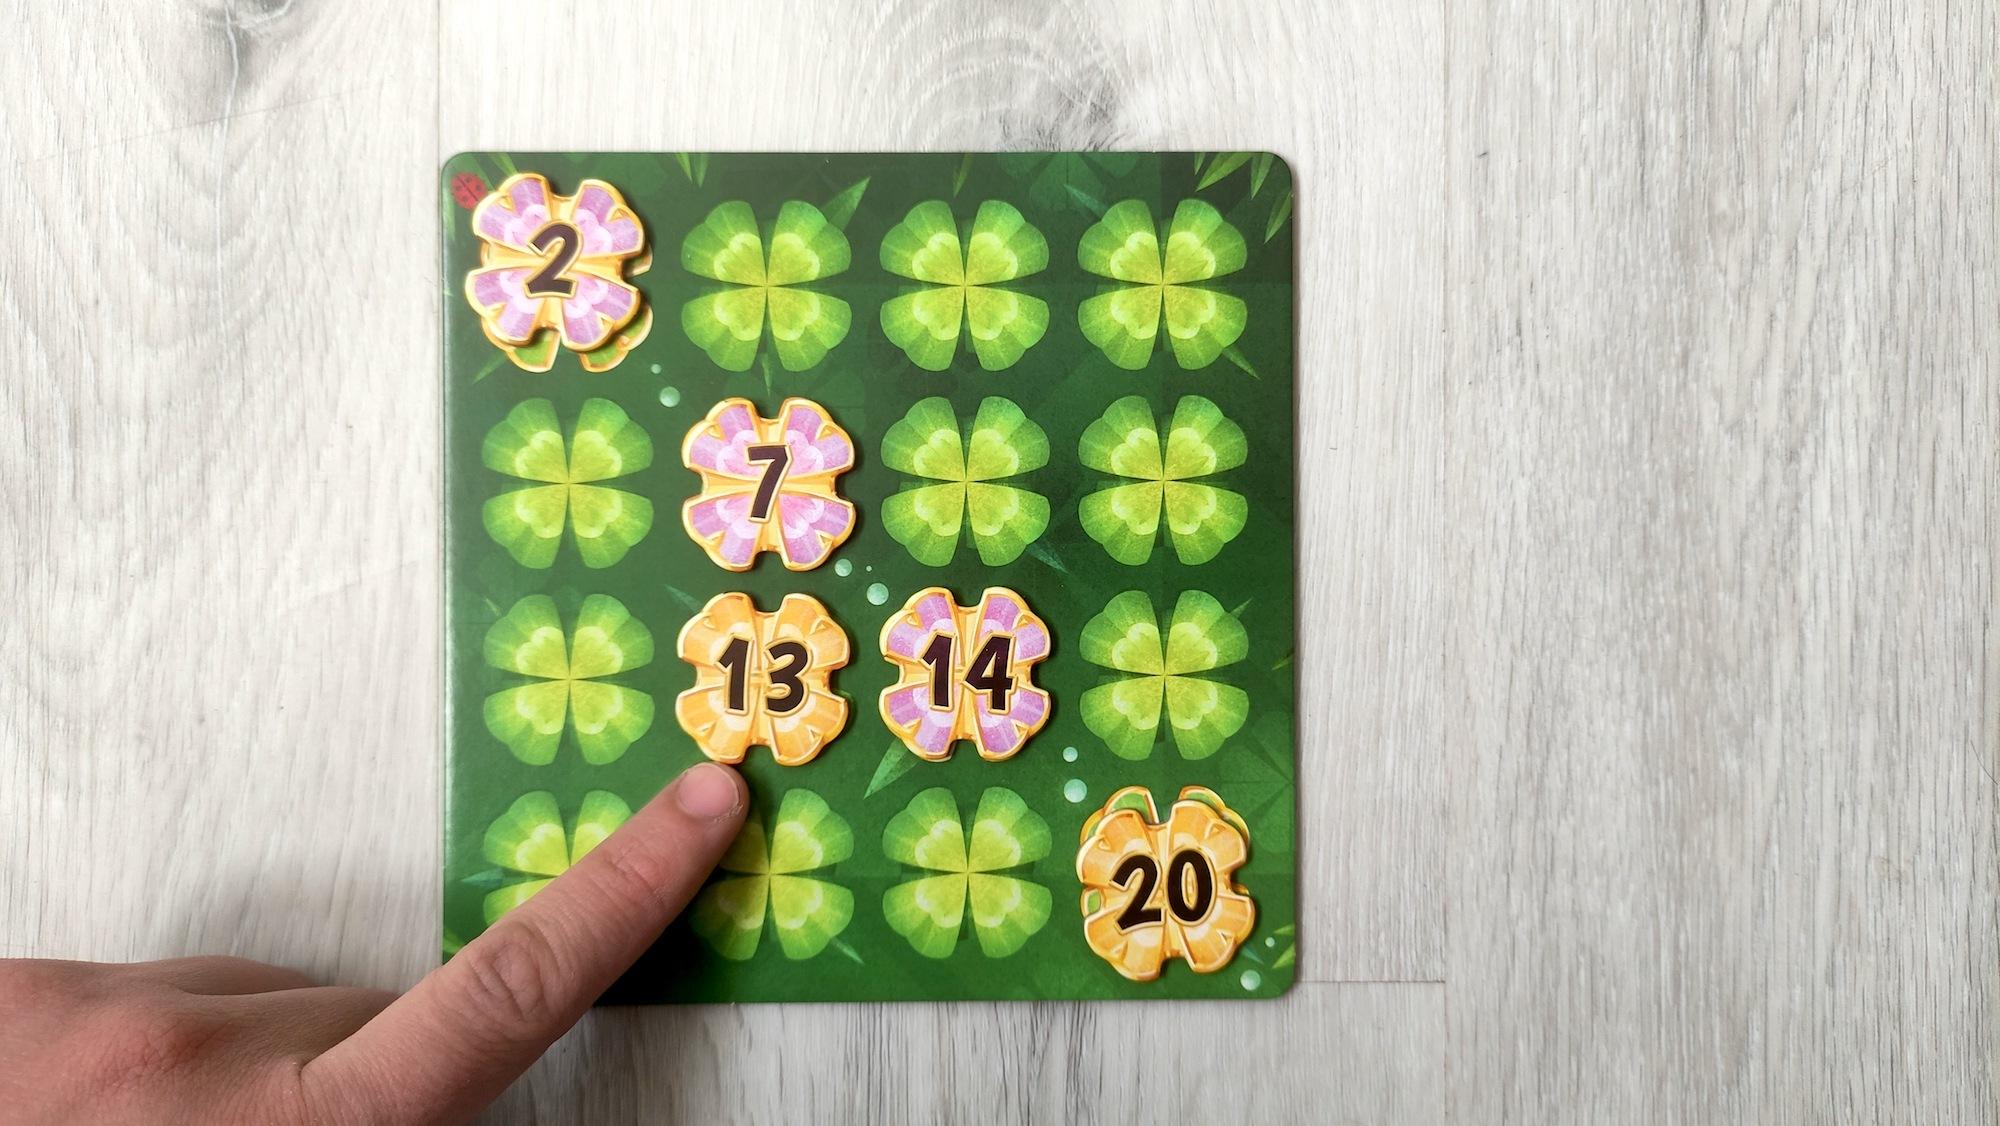 lucky-numbers-jeu-avis-test-12